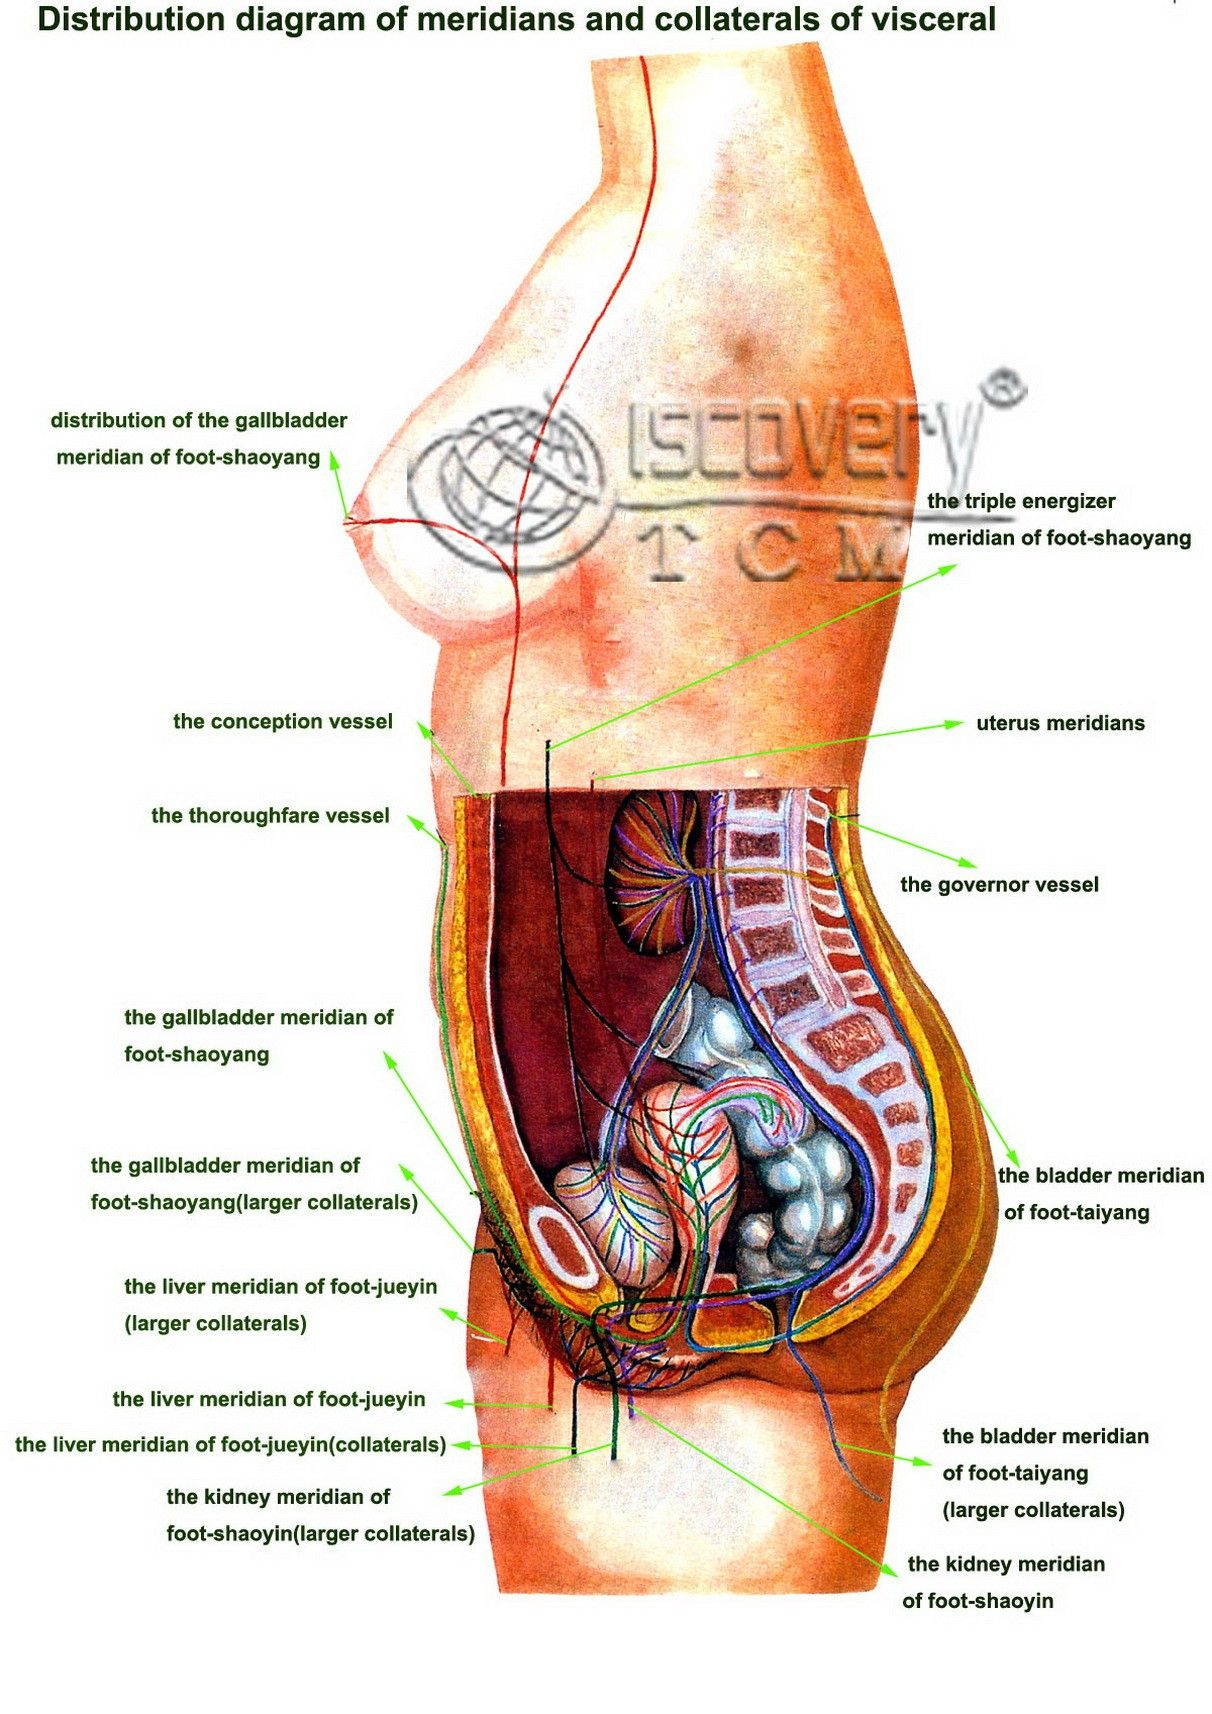 Body Parts Chart Woman : parts, chart, woman, Inside, Female, Human, Koibana.info, Organs,, Anatomy